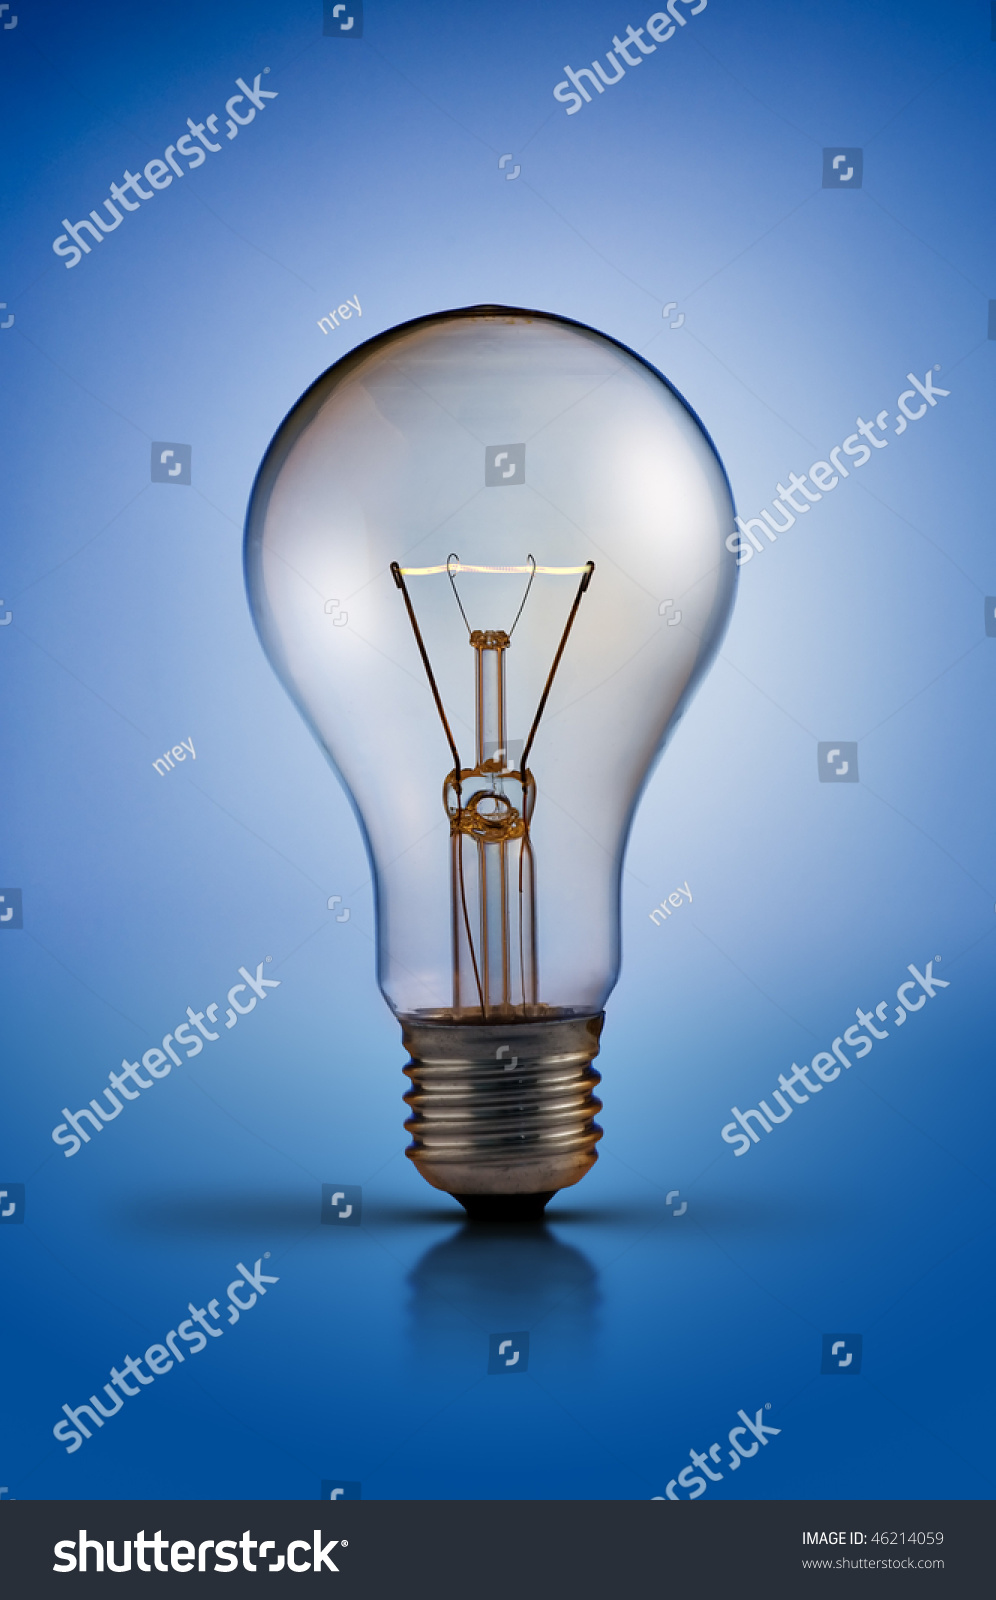 Tungsten Light Bulb Lamp On Blue Stock Photo (Royalty Free) 46214059    Shutterstock